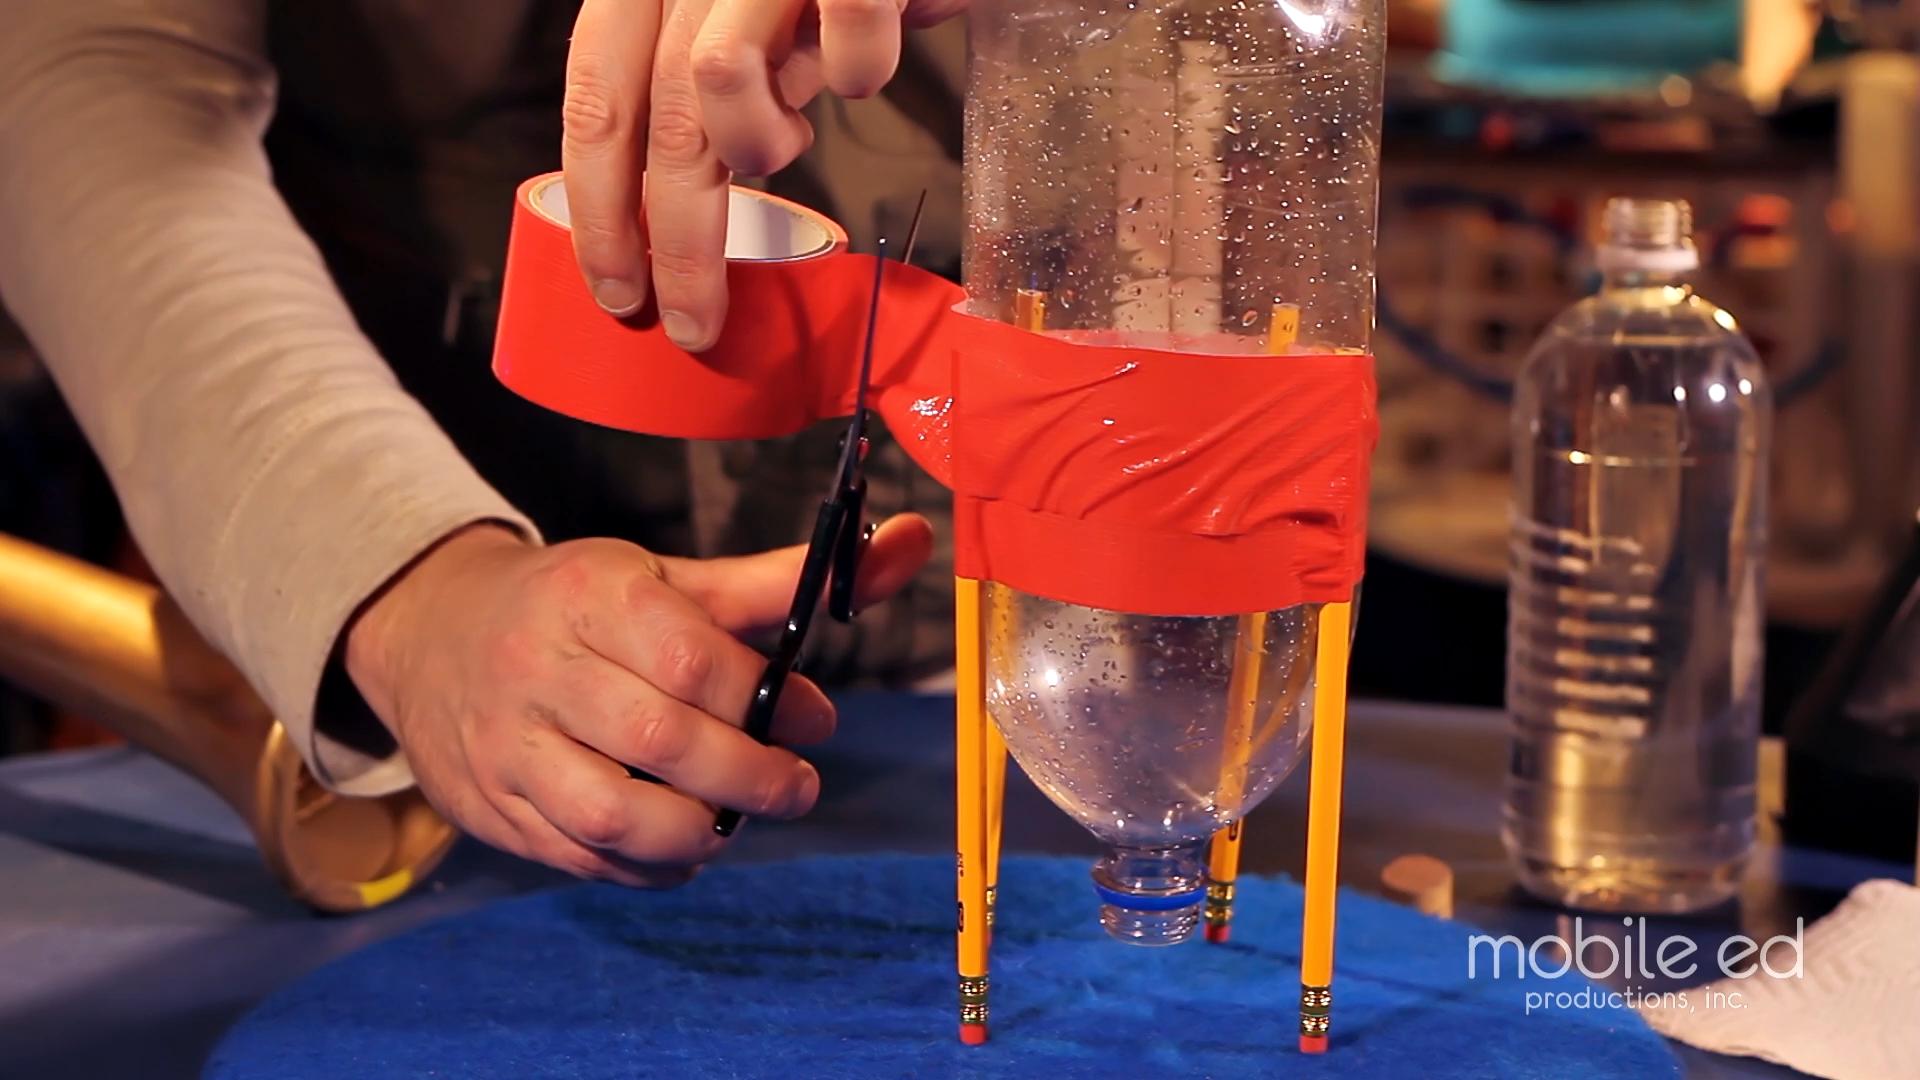 Build your own rocket - secure using tape  |  Handy Dan the Junkyard Man